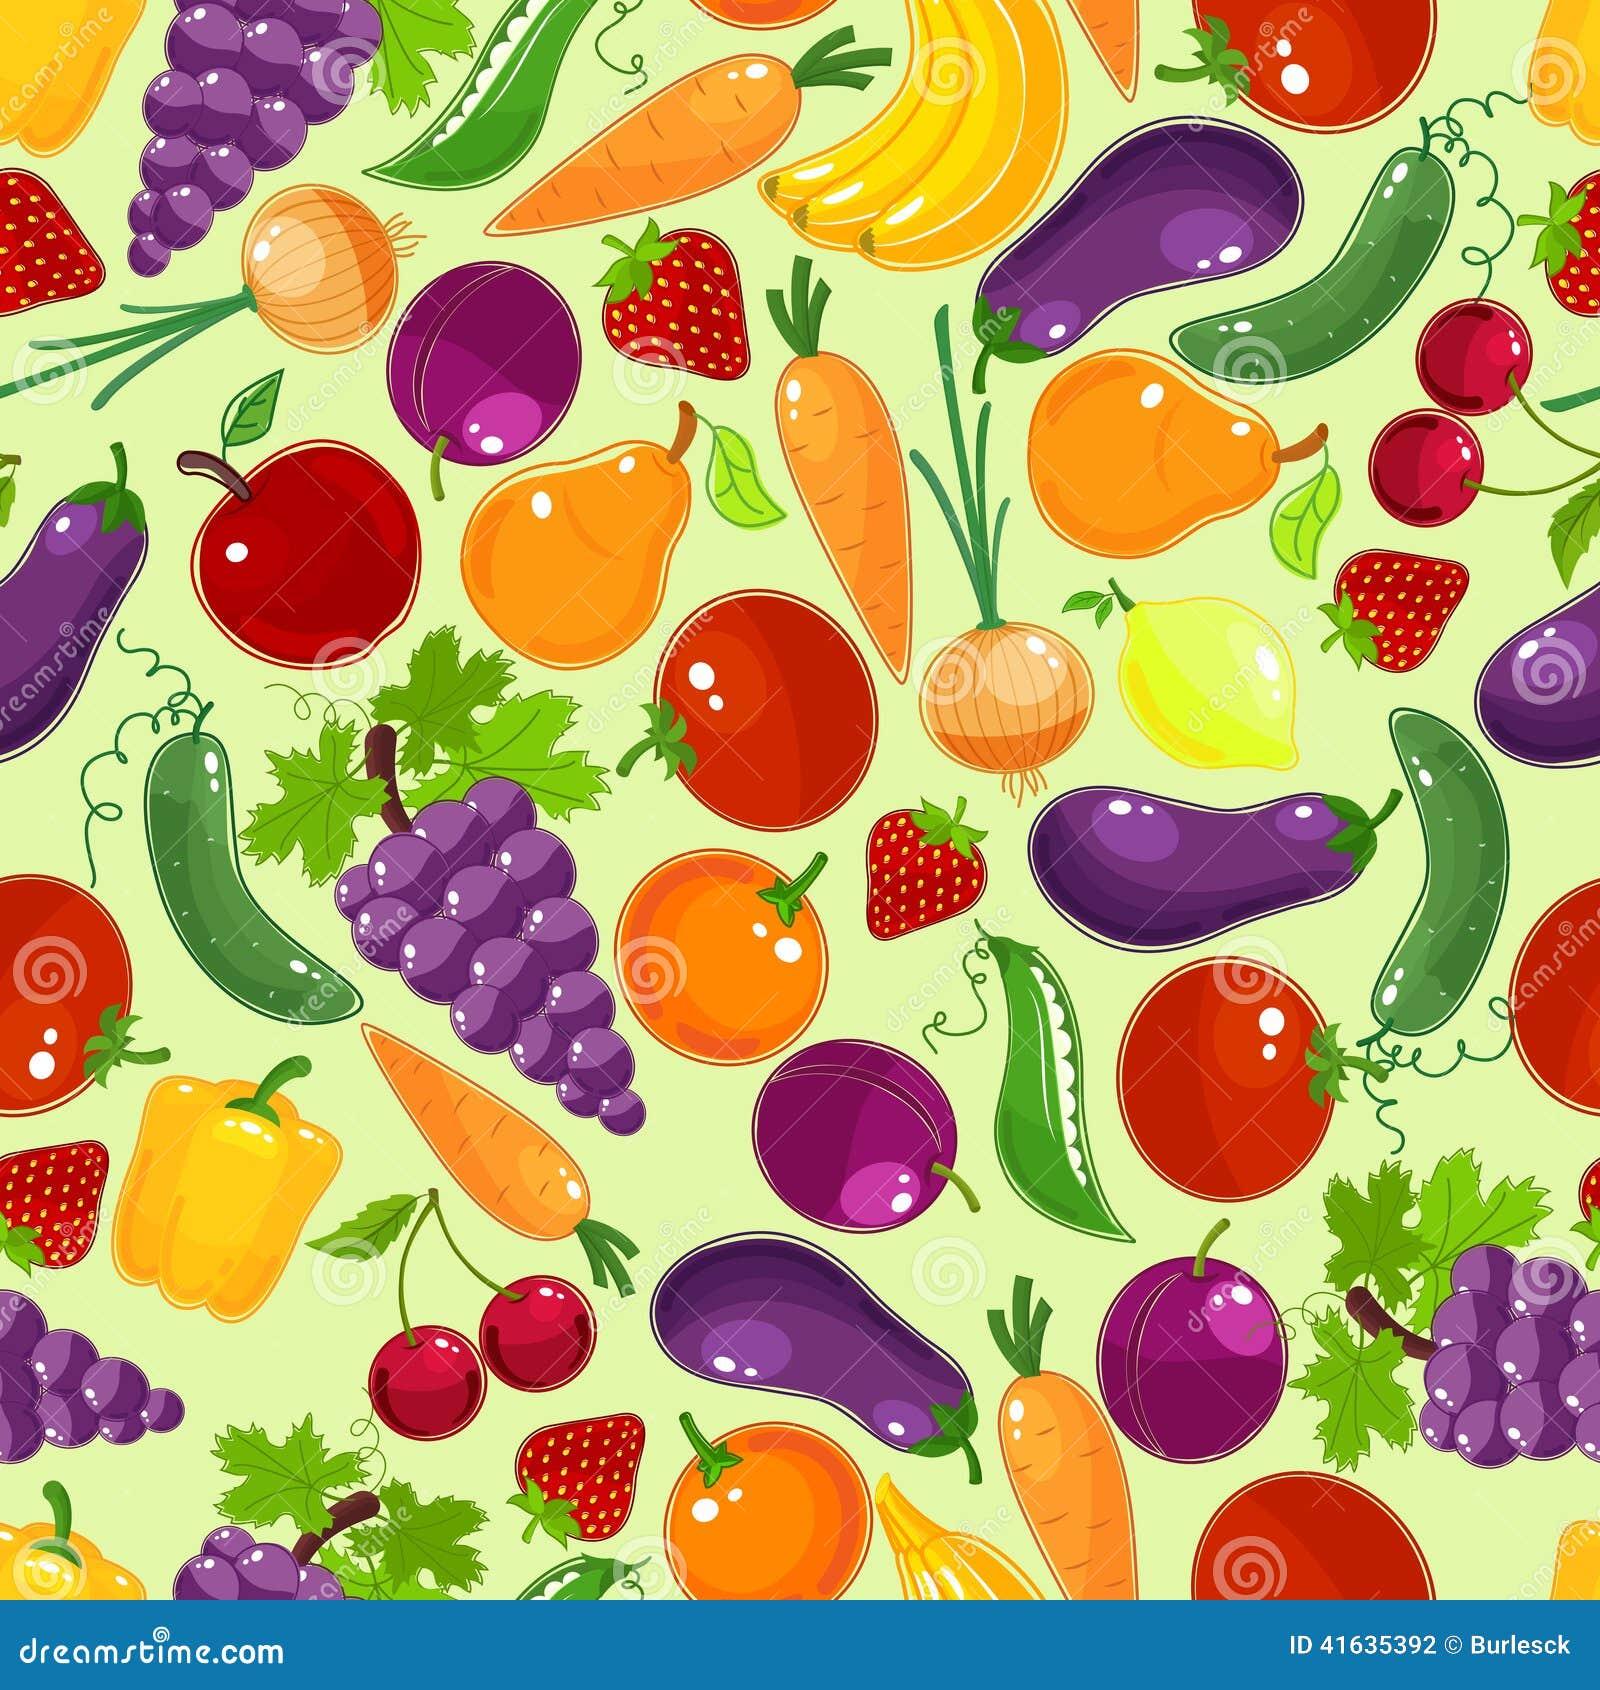 Sonic The Hedgehog Headshot Colorful fruit and veg...